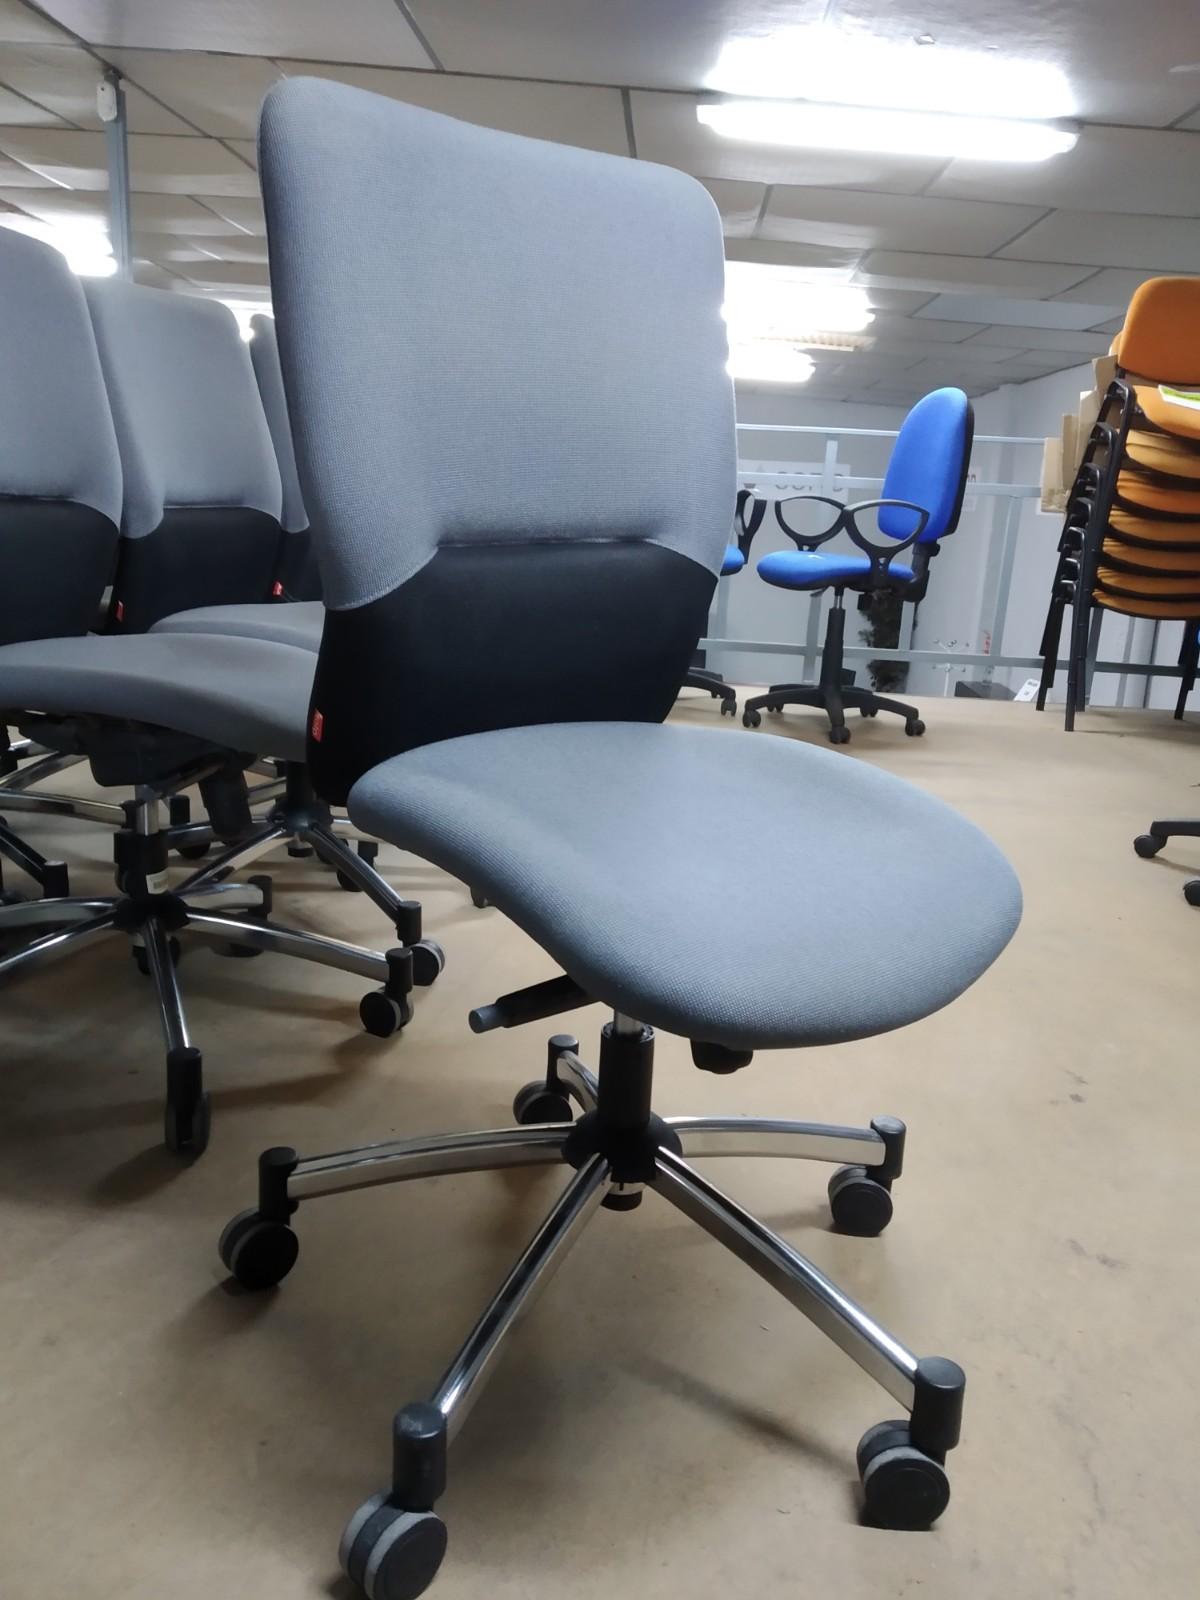 precio sillas giratorias oficinas marbella